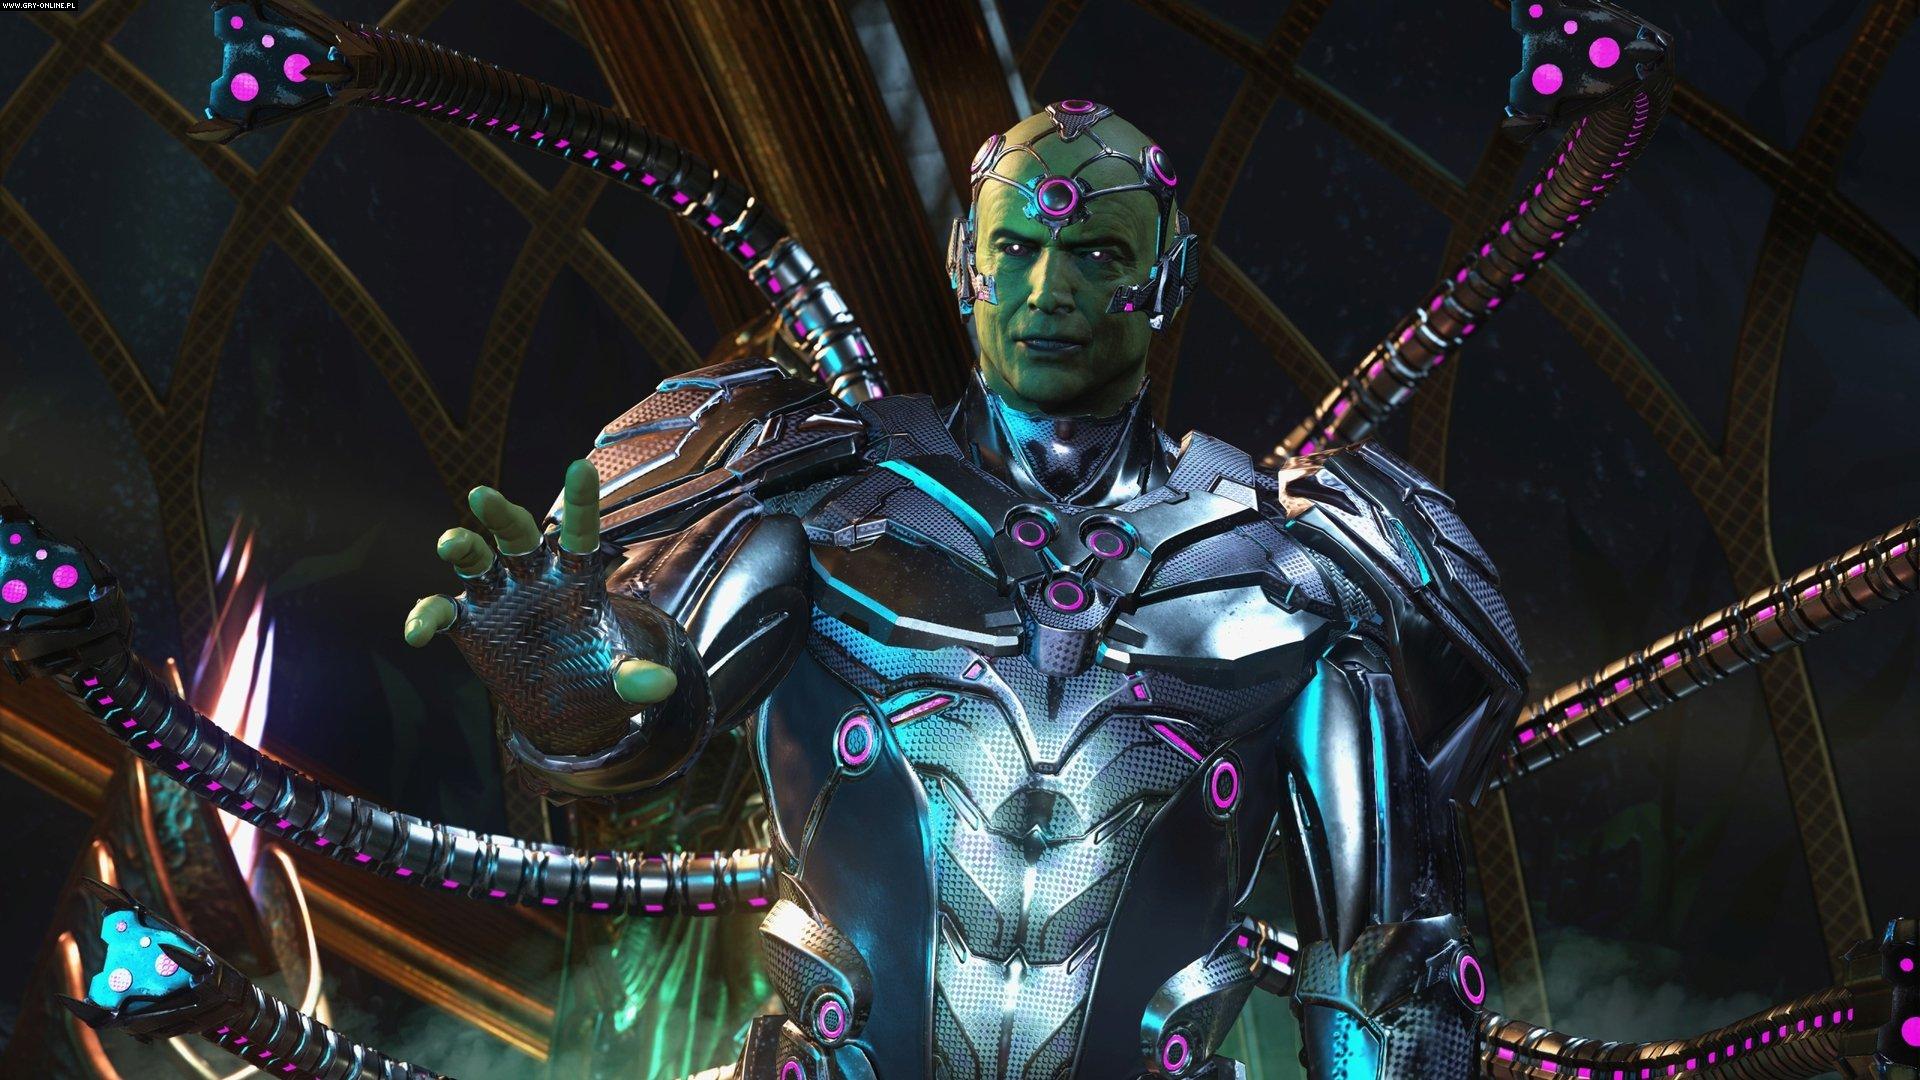 Injustice 2 PS4, XONE Games Image 17/24, NetherRealm Studios , Warner Bros Interactive Entertainment